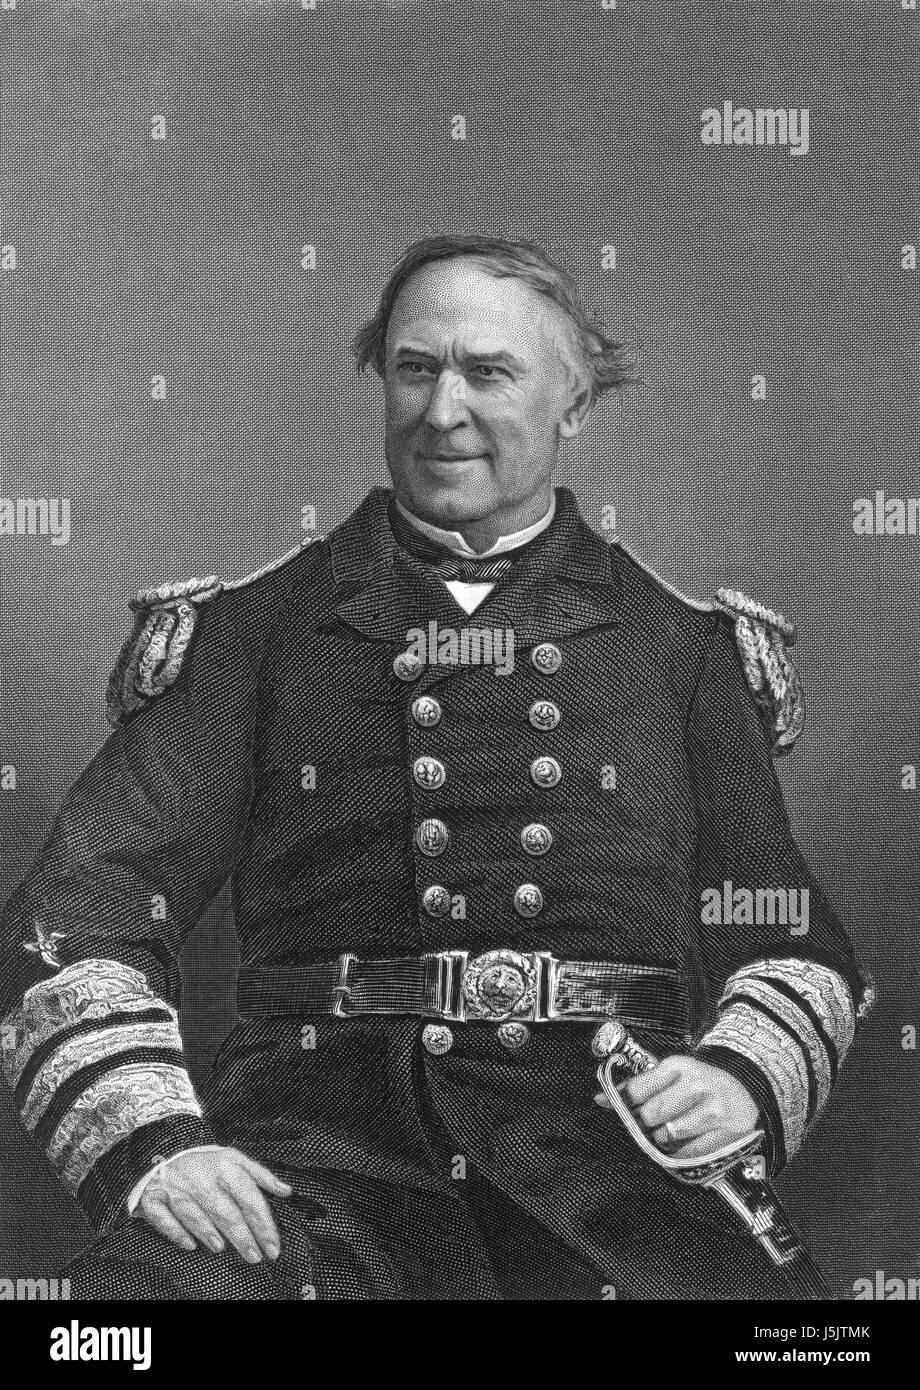 David G. Farragut (1801-70), American Admiral, U.S. Navy, Portrait, late 1860's - Stock Image